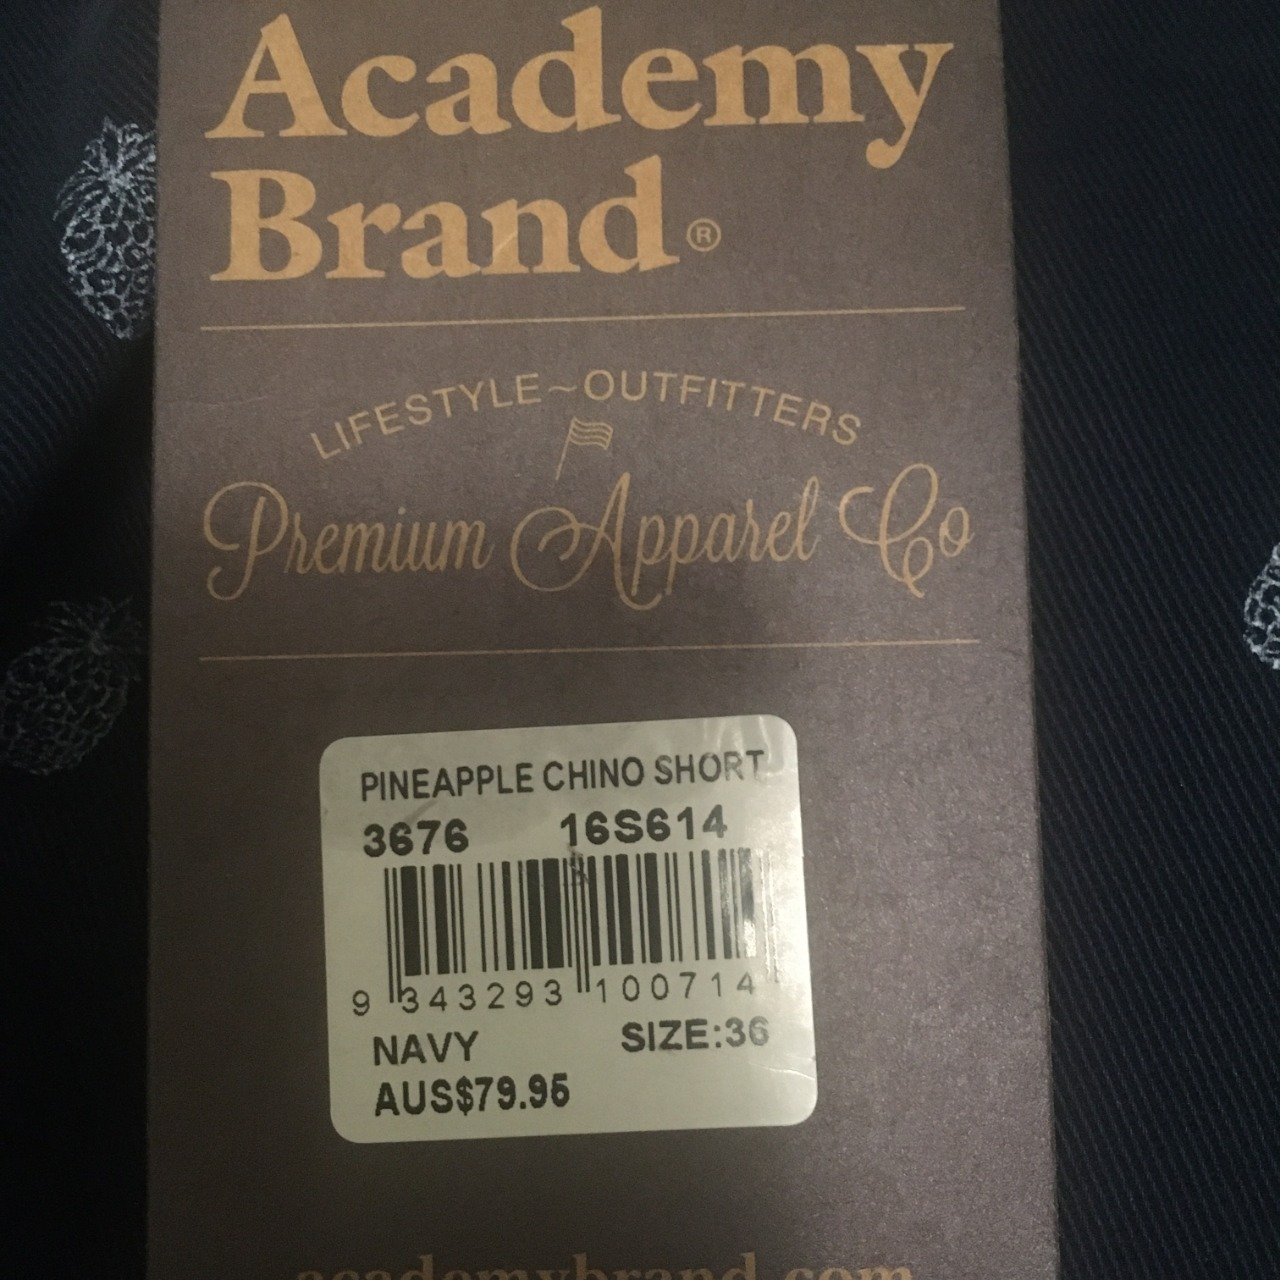 Academy Brand Mens  Size 36 Navy Blue Pineapple Chino Shorts Brand New